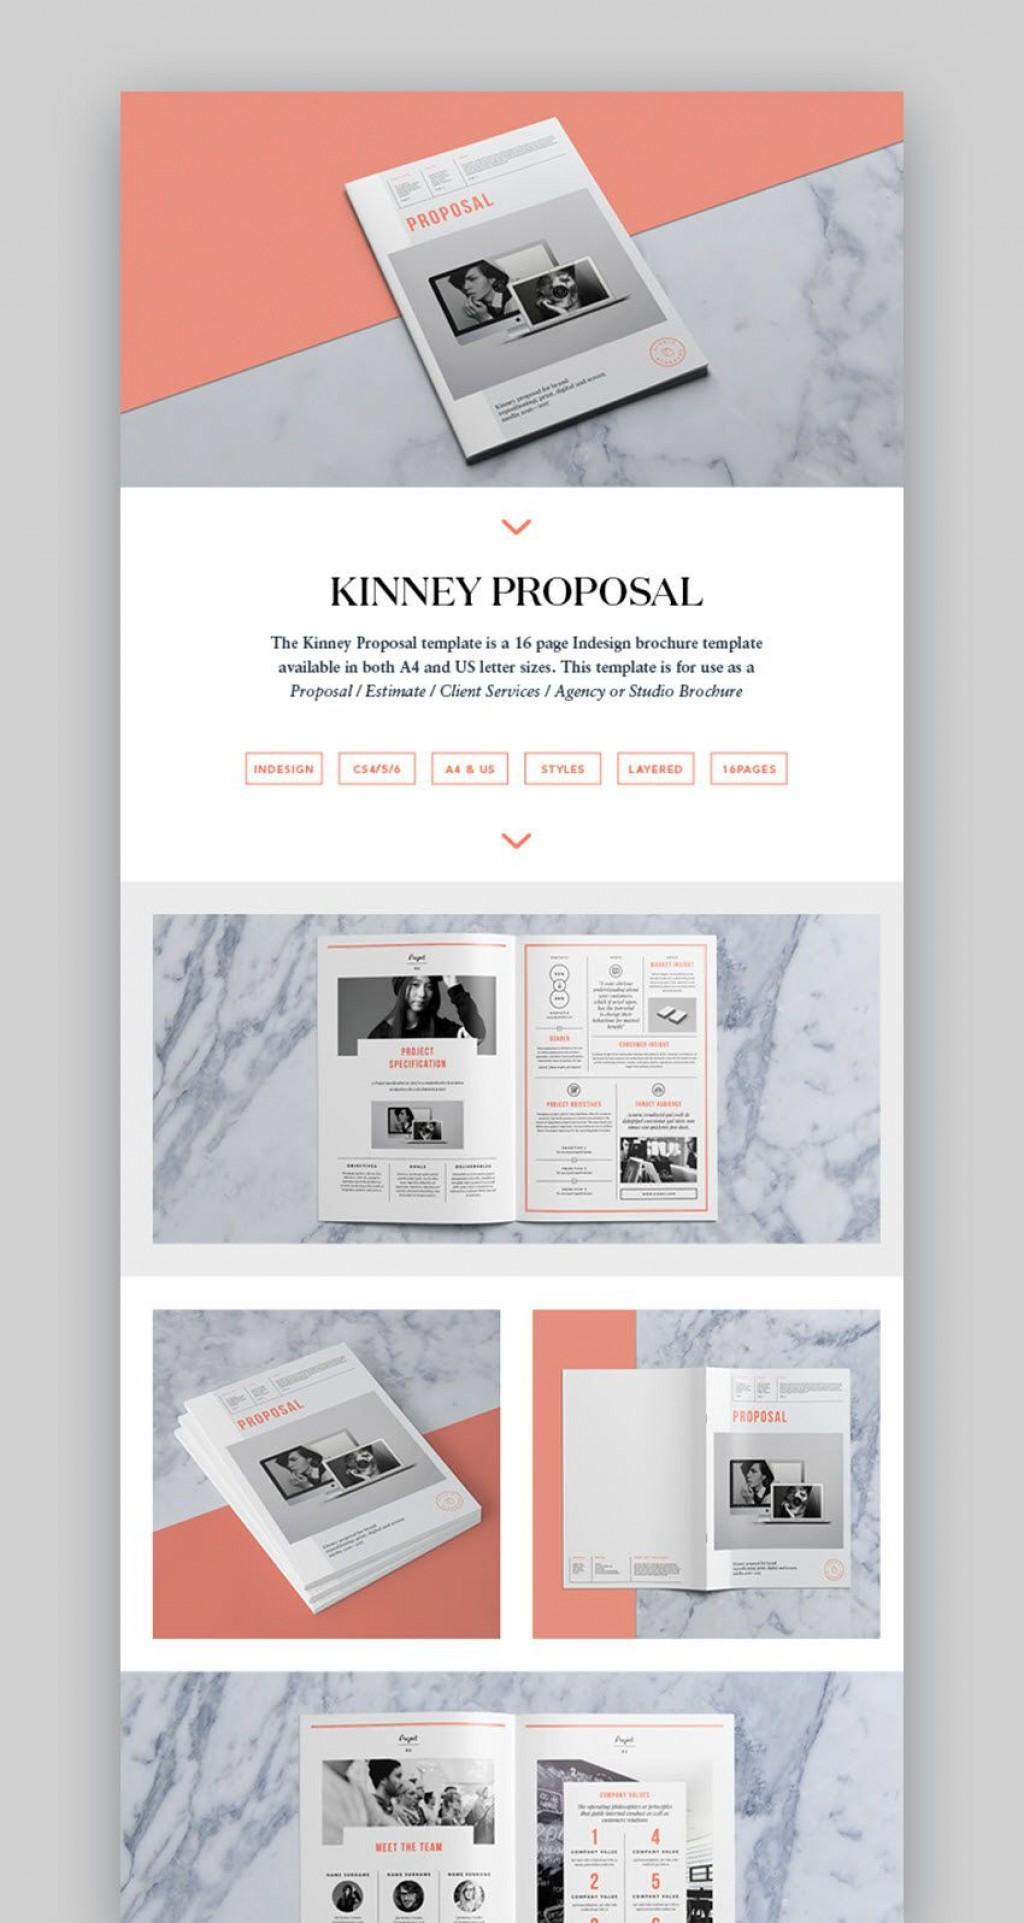 005 Impressive Graphic Design Proposal Sample Inspiration  Pdf Free Template IndesignLarge